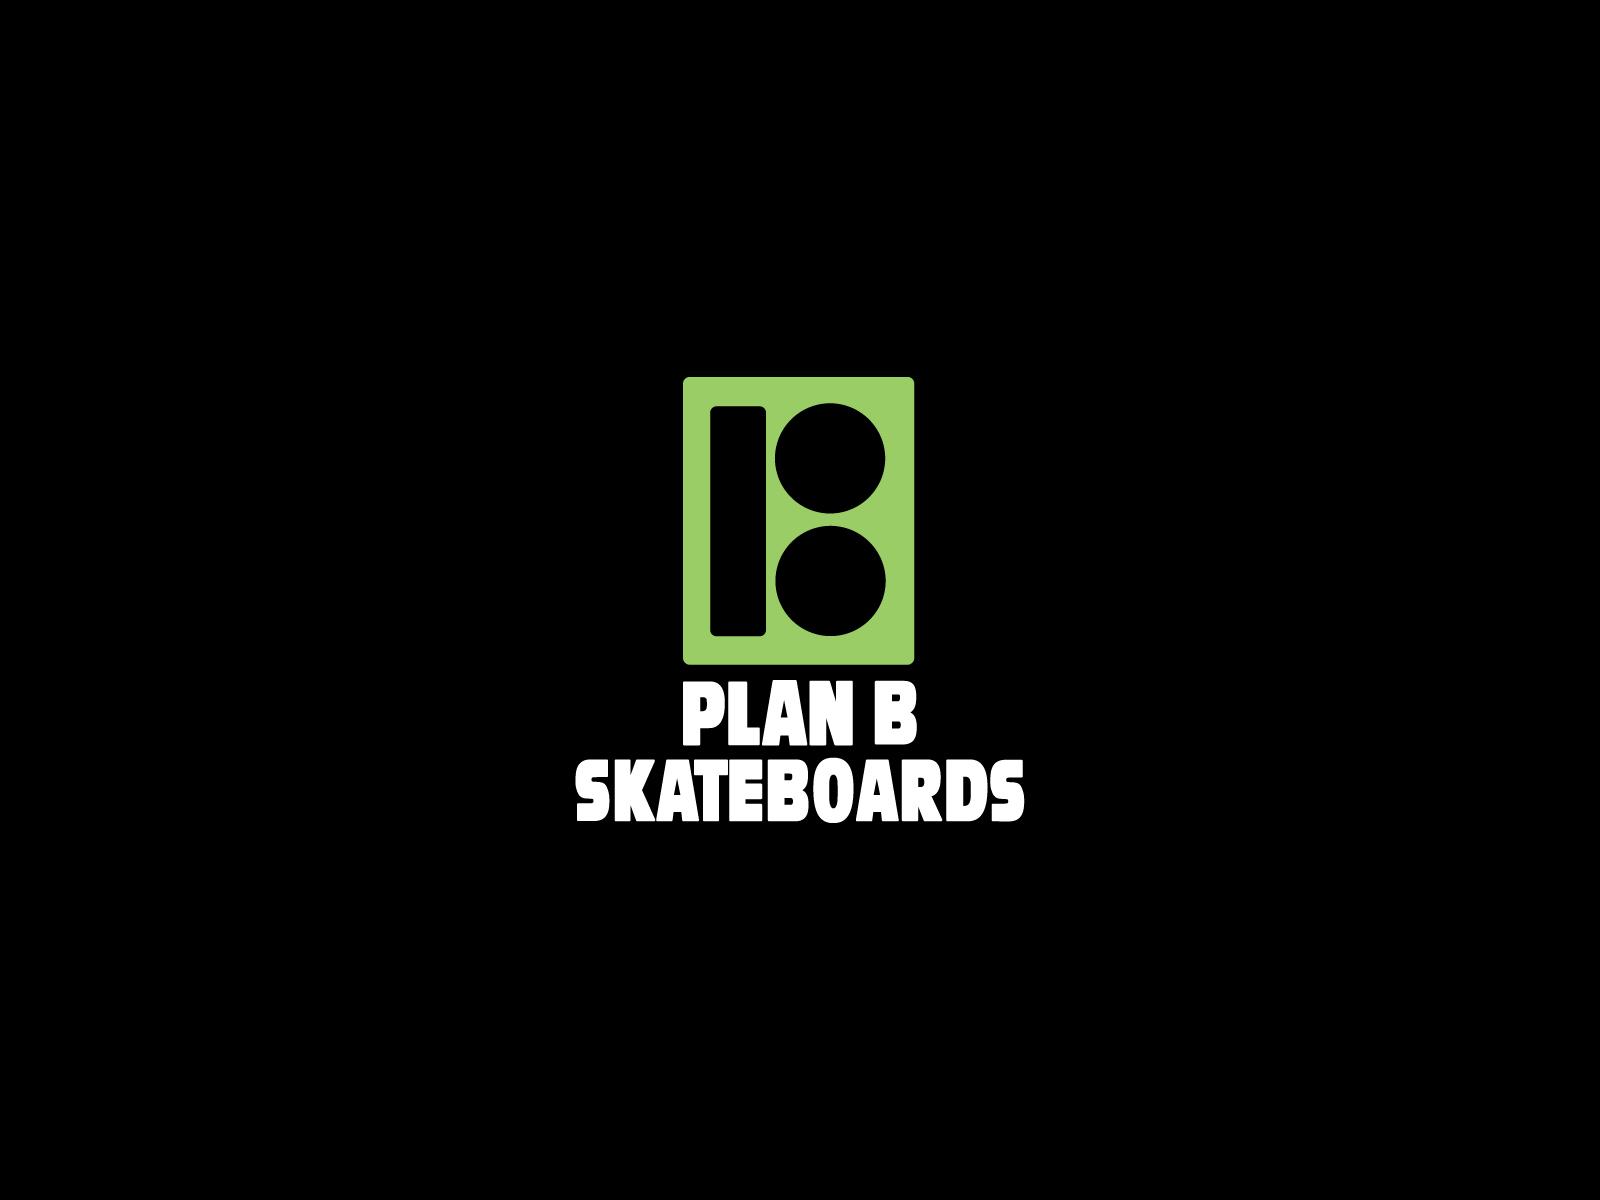 Girl Skateboard Company Wallpaper Plan b Skateboards Logo 1600x1200